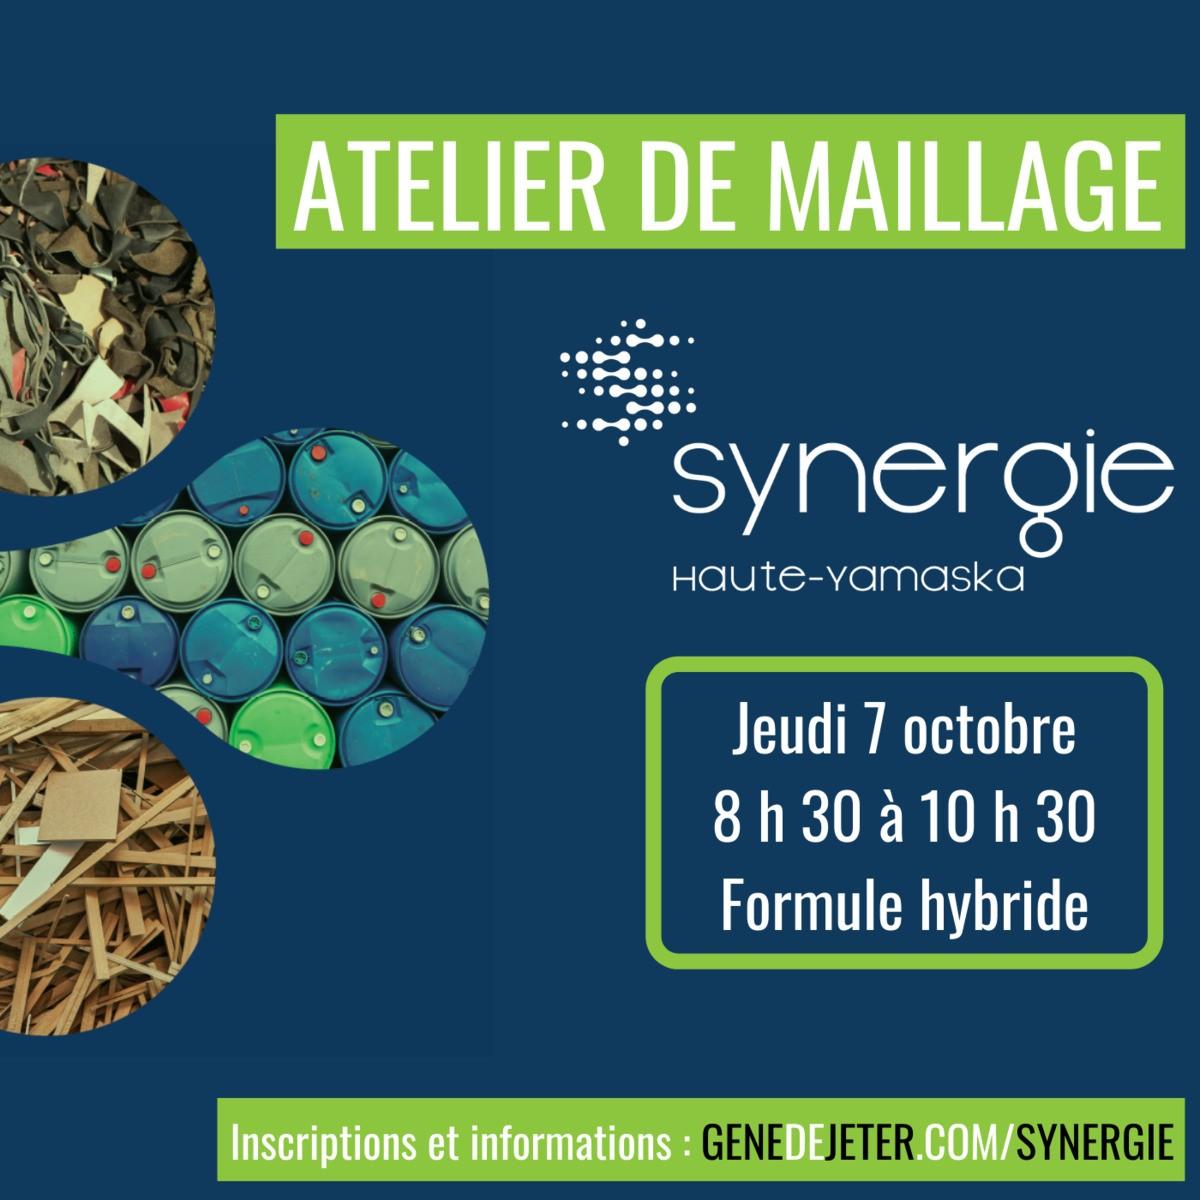 Atelier de maillage hybride Synergie Haute-Yamaska